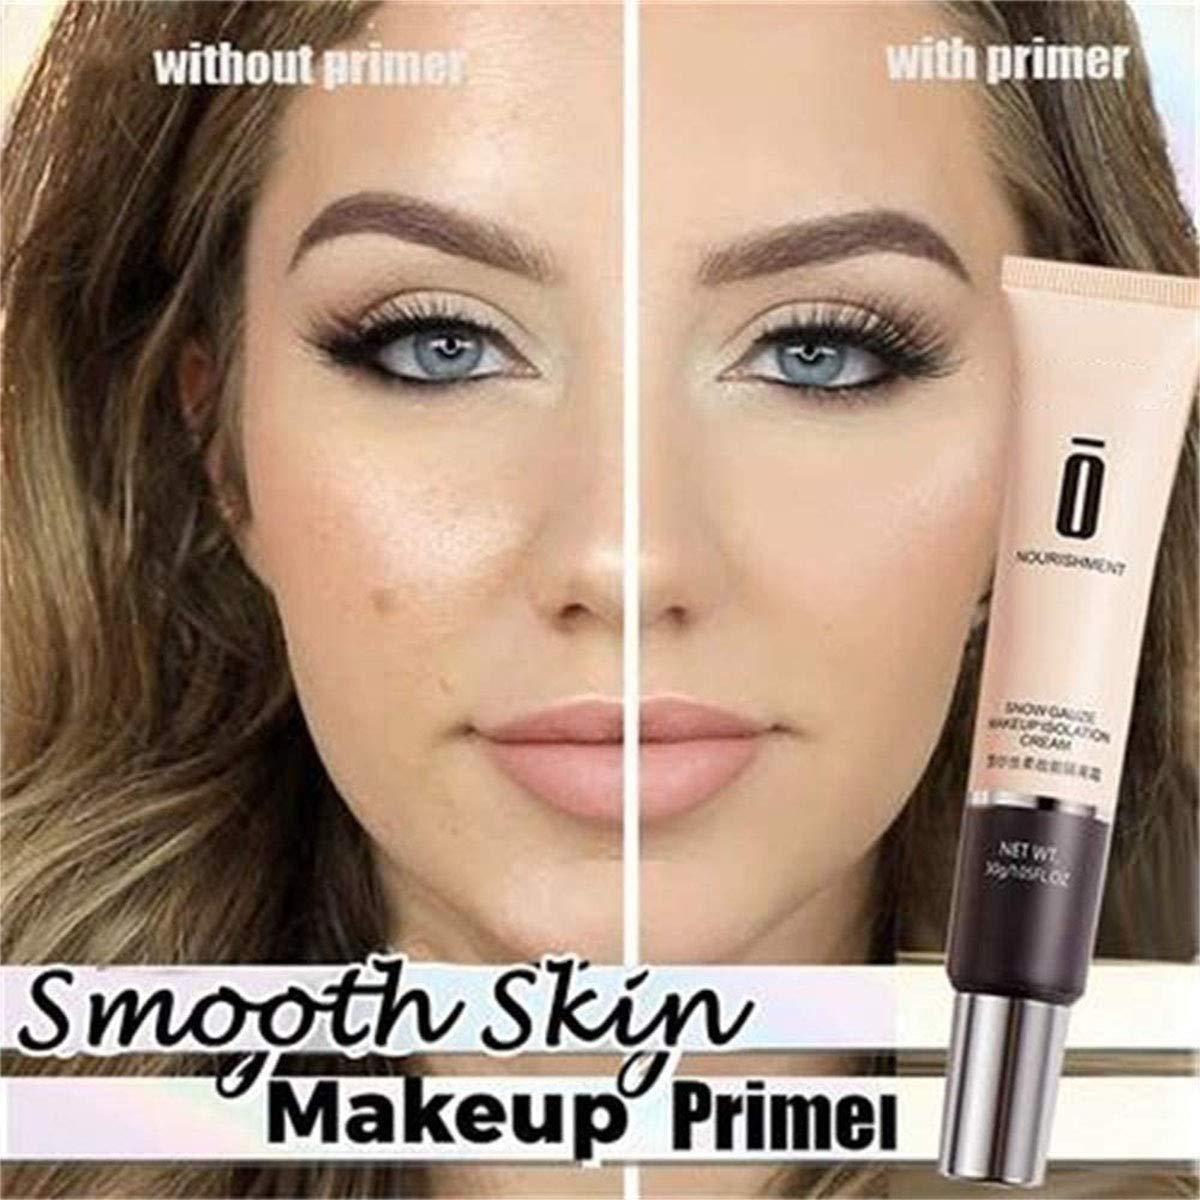 2Pcs Por eless Primer Cream, No Pore Blem Primer Base, Redness & Pore Covering Green Toned Makeup Base Primer, Skin Tone Correcting and Brightening Primer Purple Toned Makeup Base Primer (Natural)